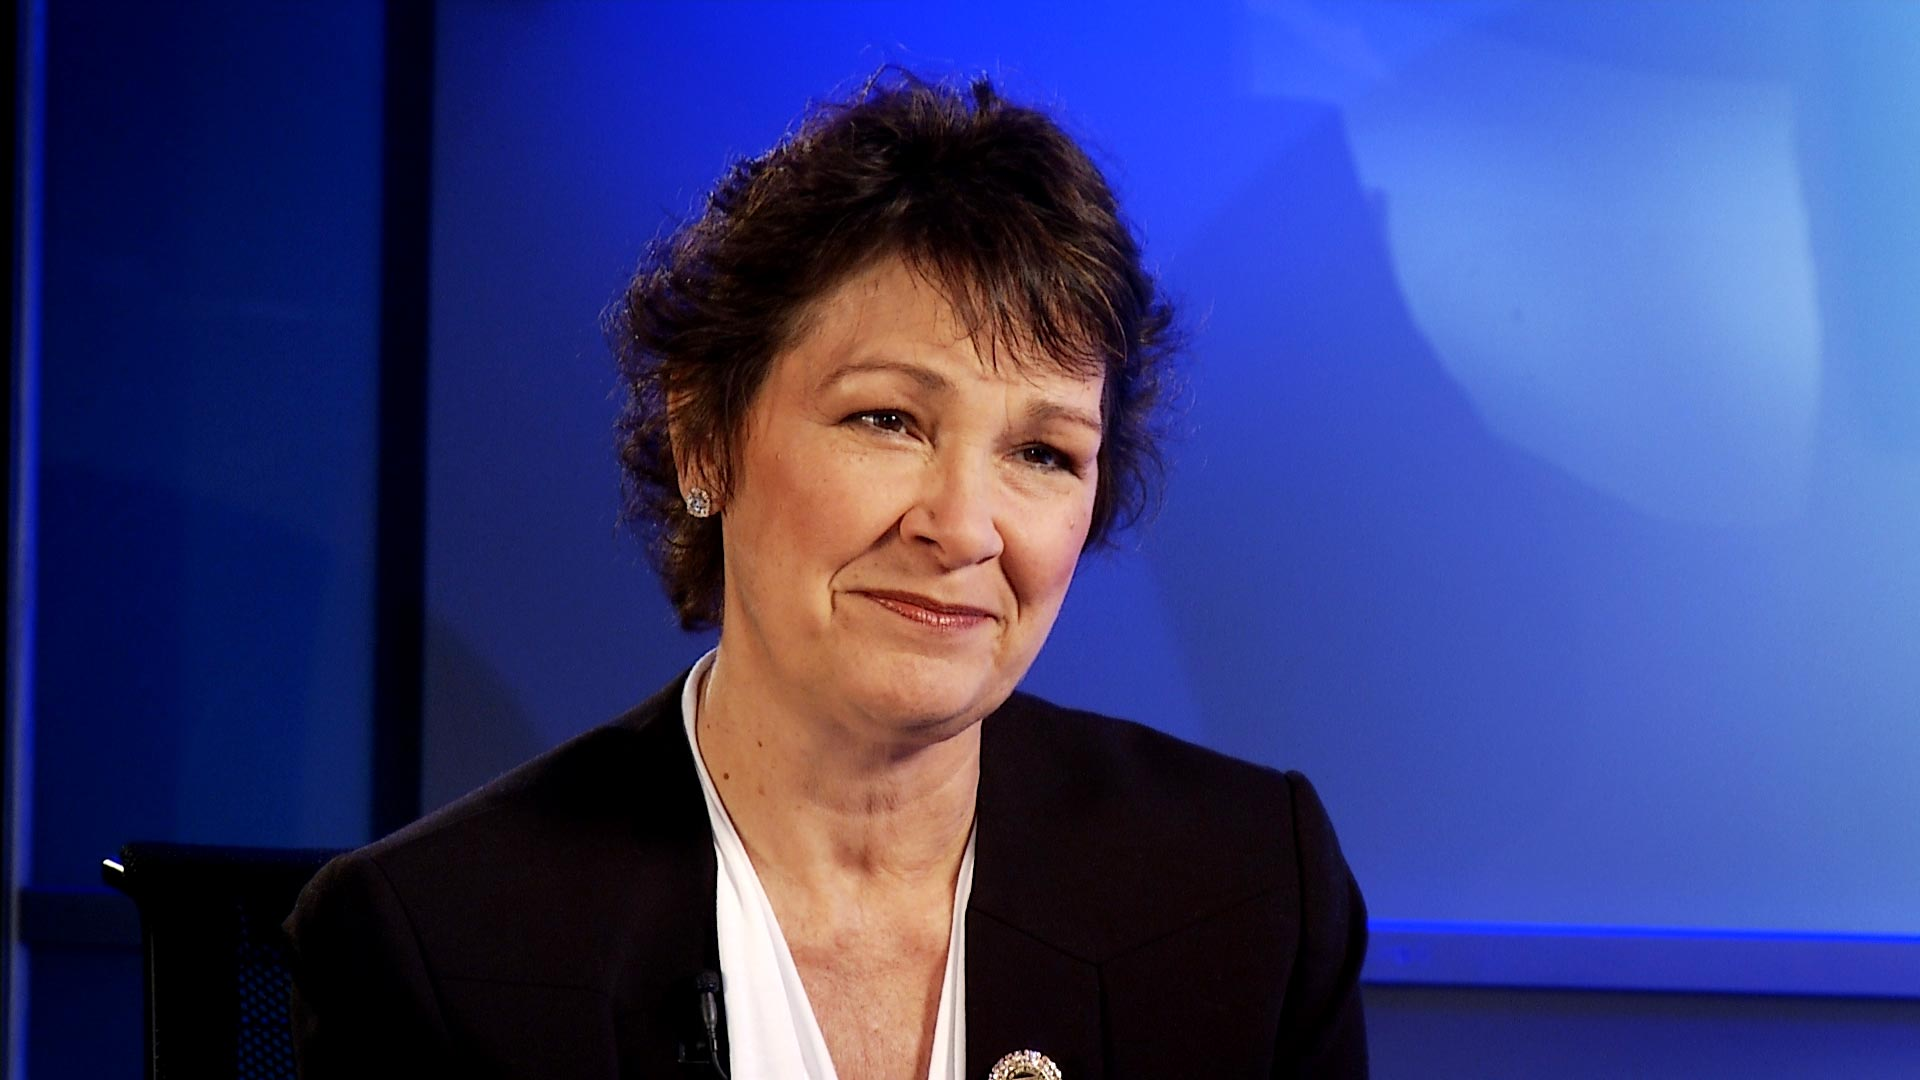 State Sen. Victoria Steele (D) at Arizona Public Media on February 1, 2019.